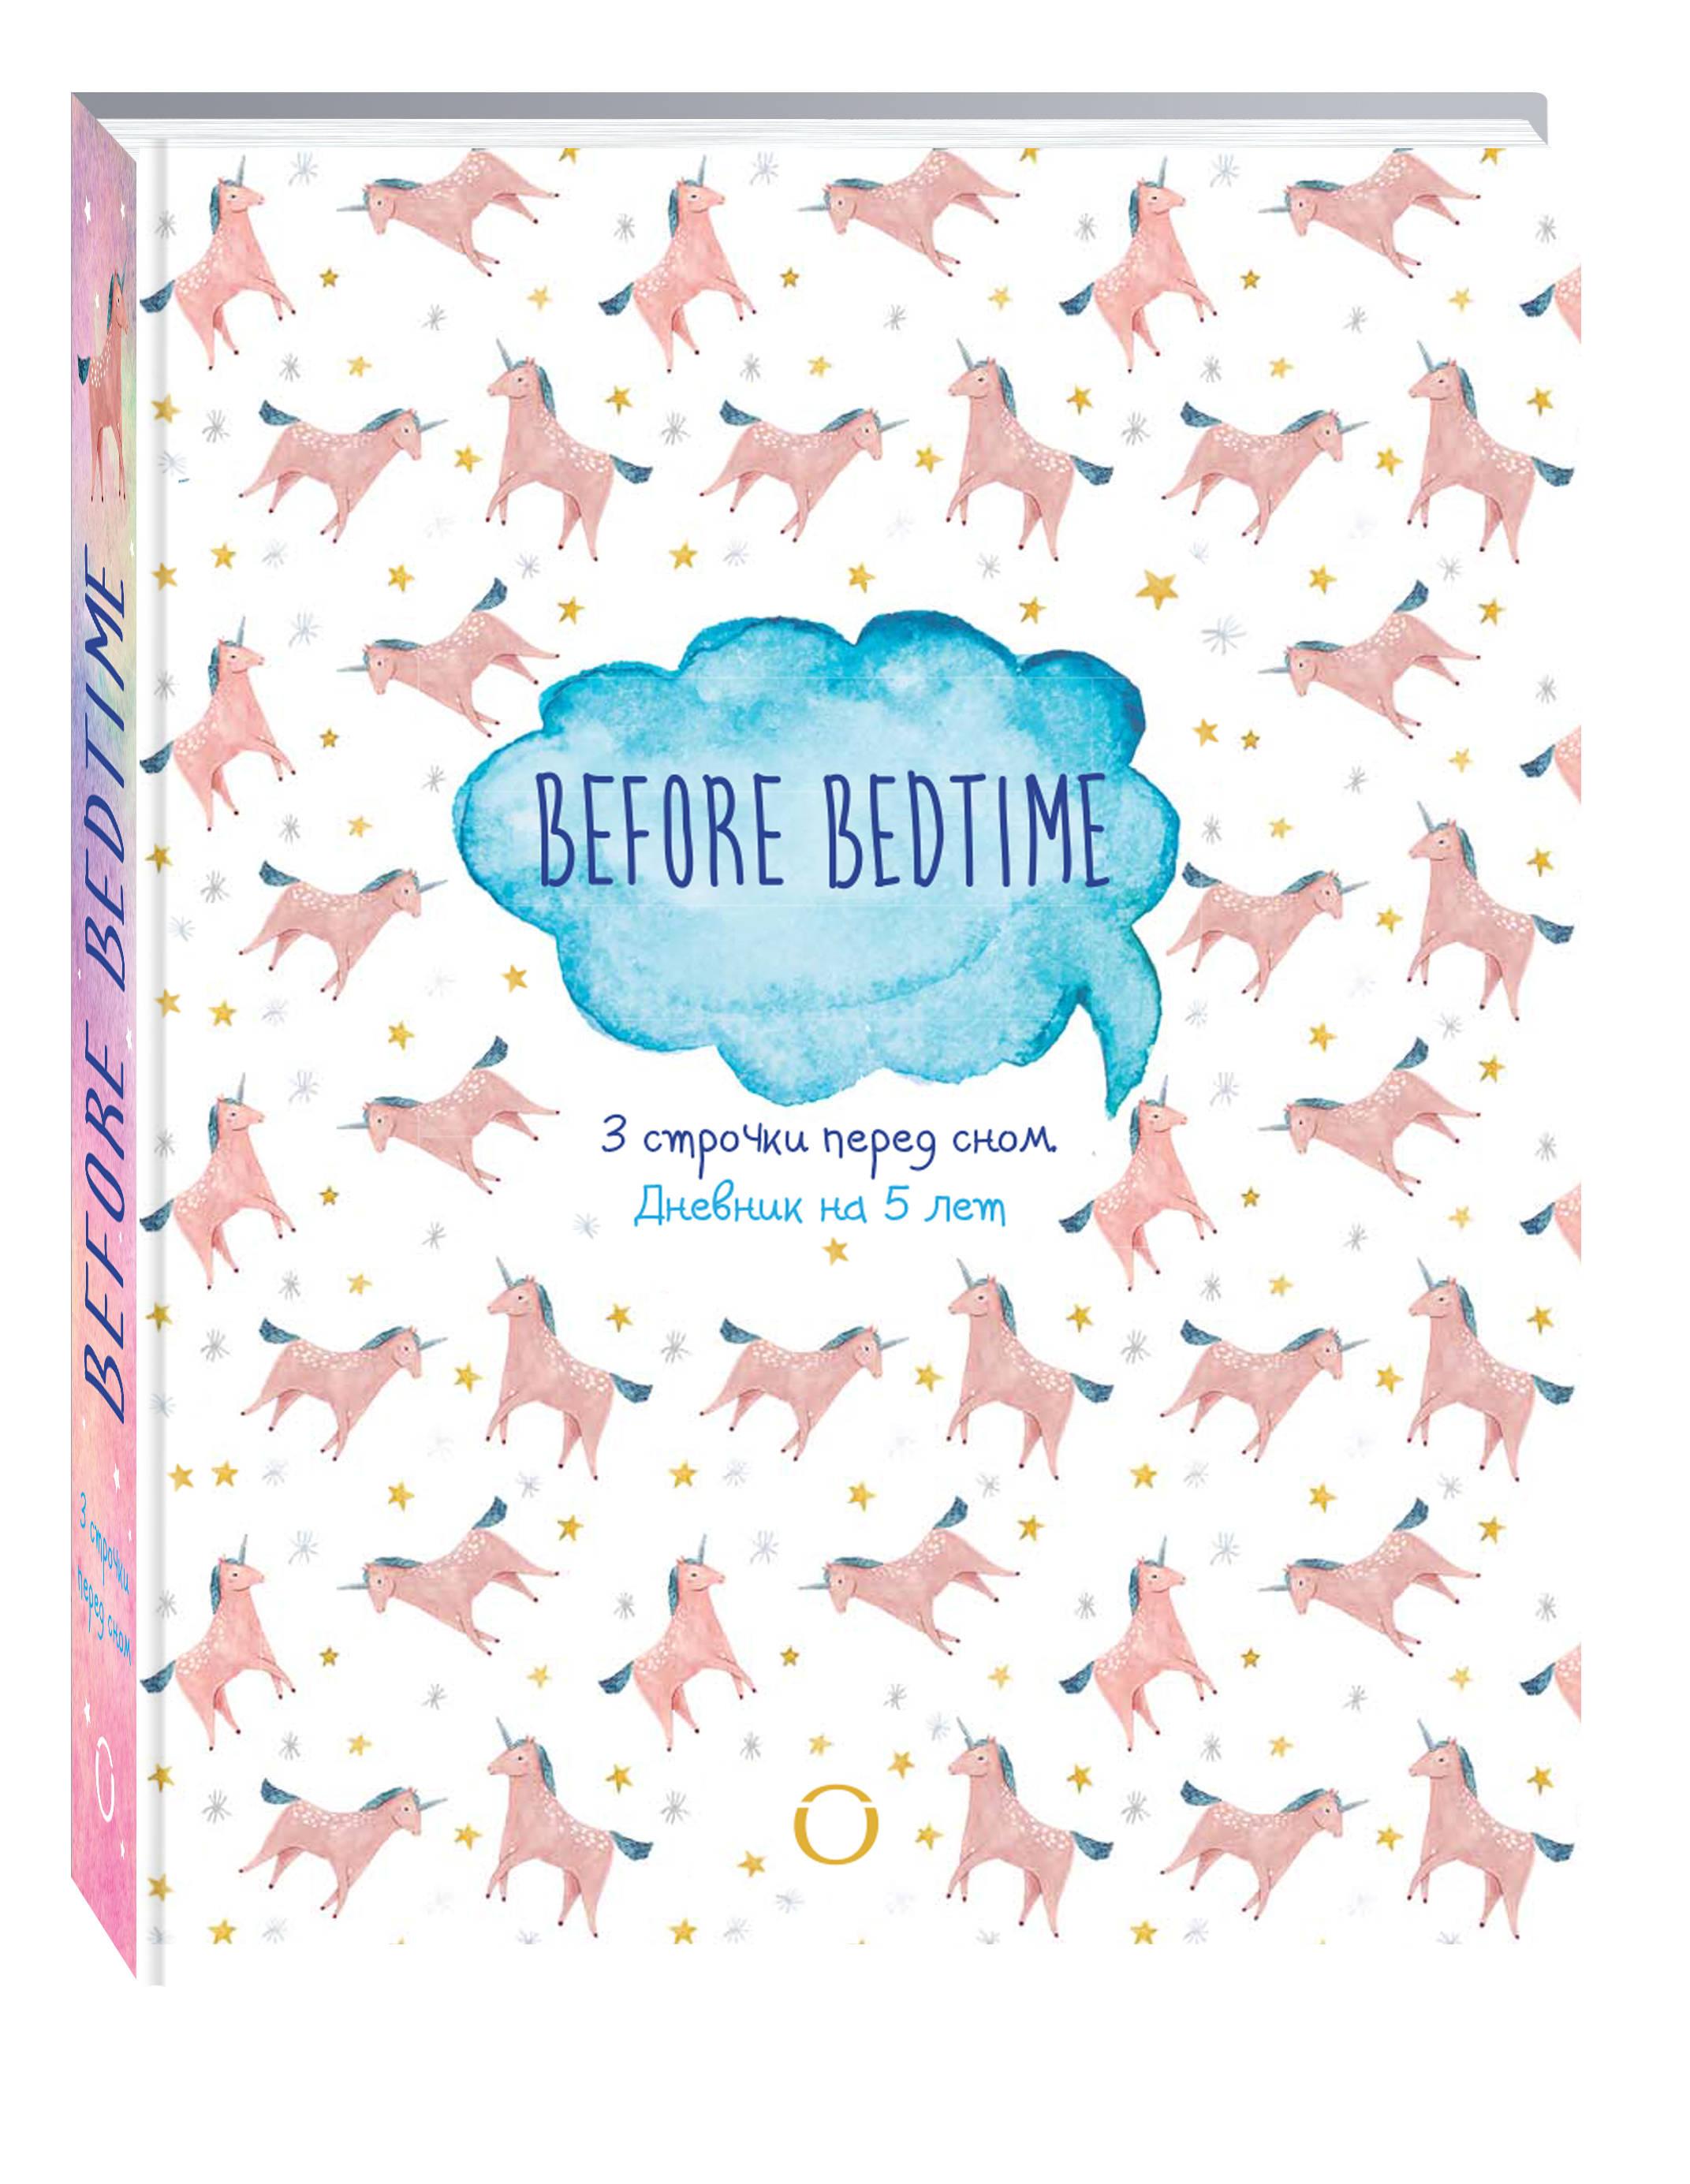 BEFORE BEDTIME. 3 строчки перед сном. Дневник на 5 лет